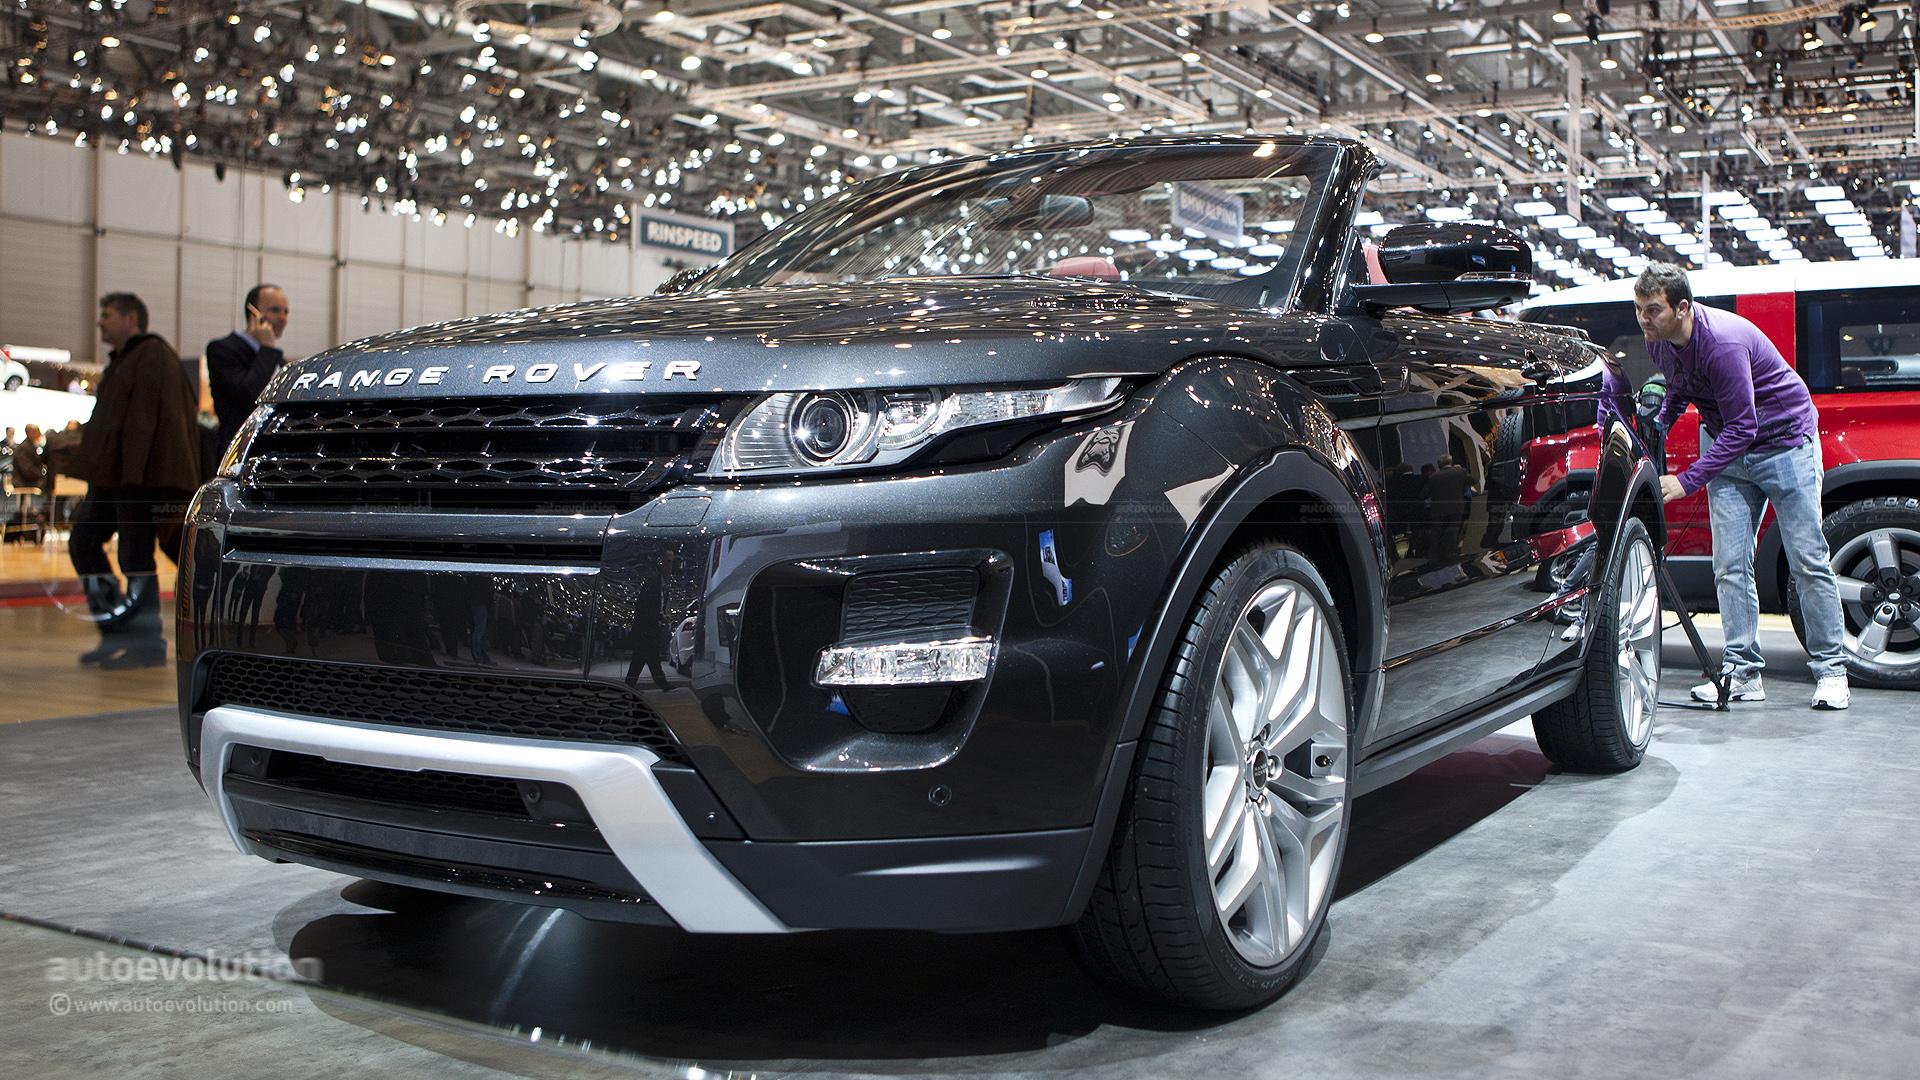 range rover evoque cabrio could be ready in 2015 autoevolution. Black Bedroom Furniture Sets. Home Design Ideas